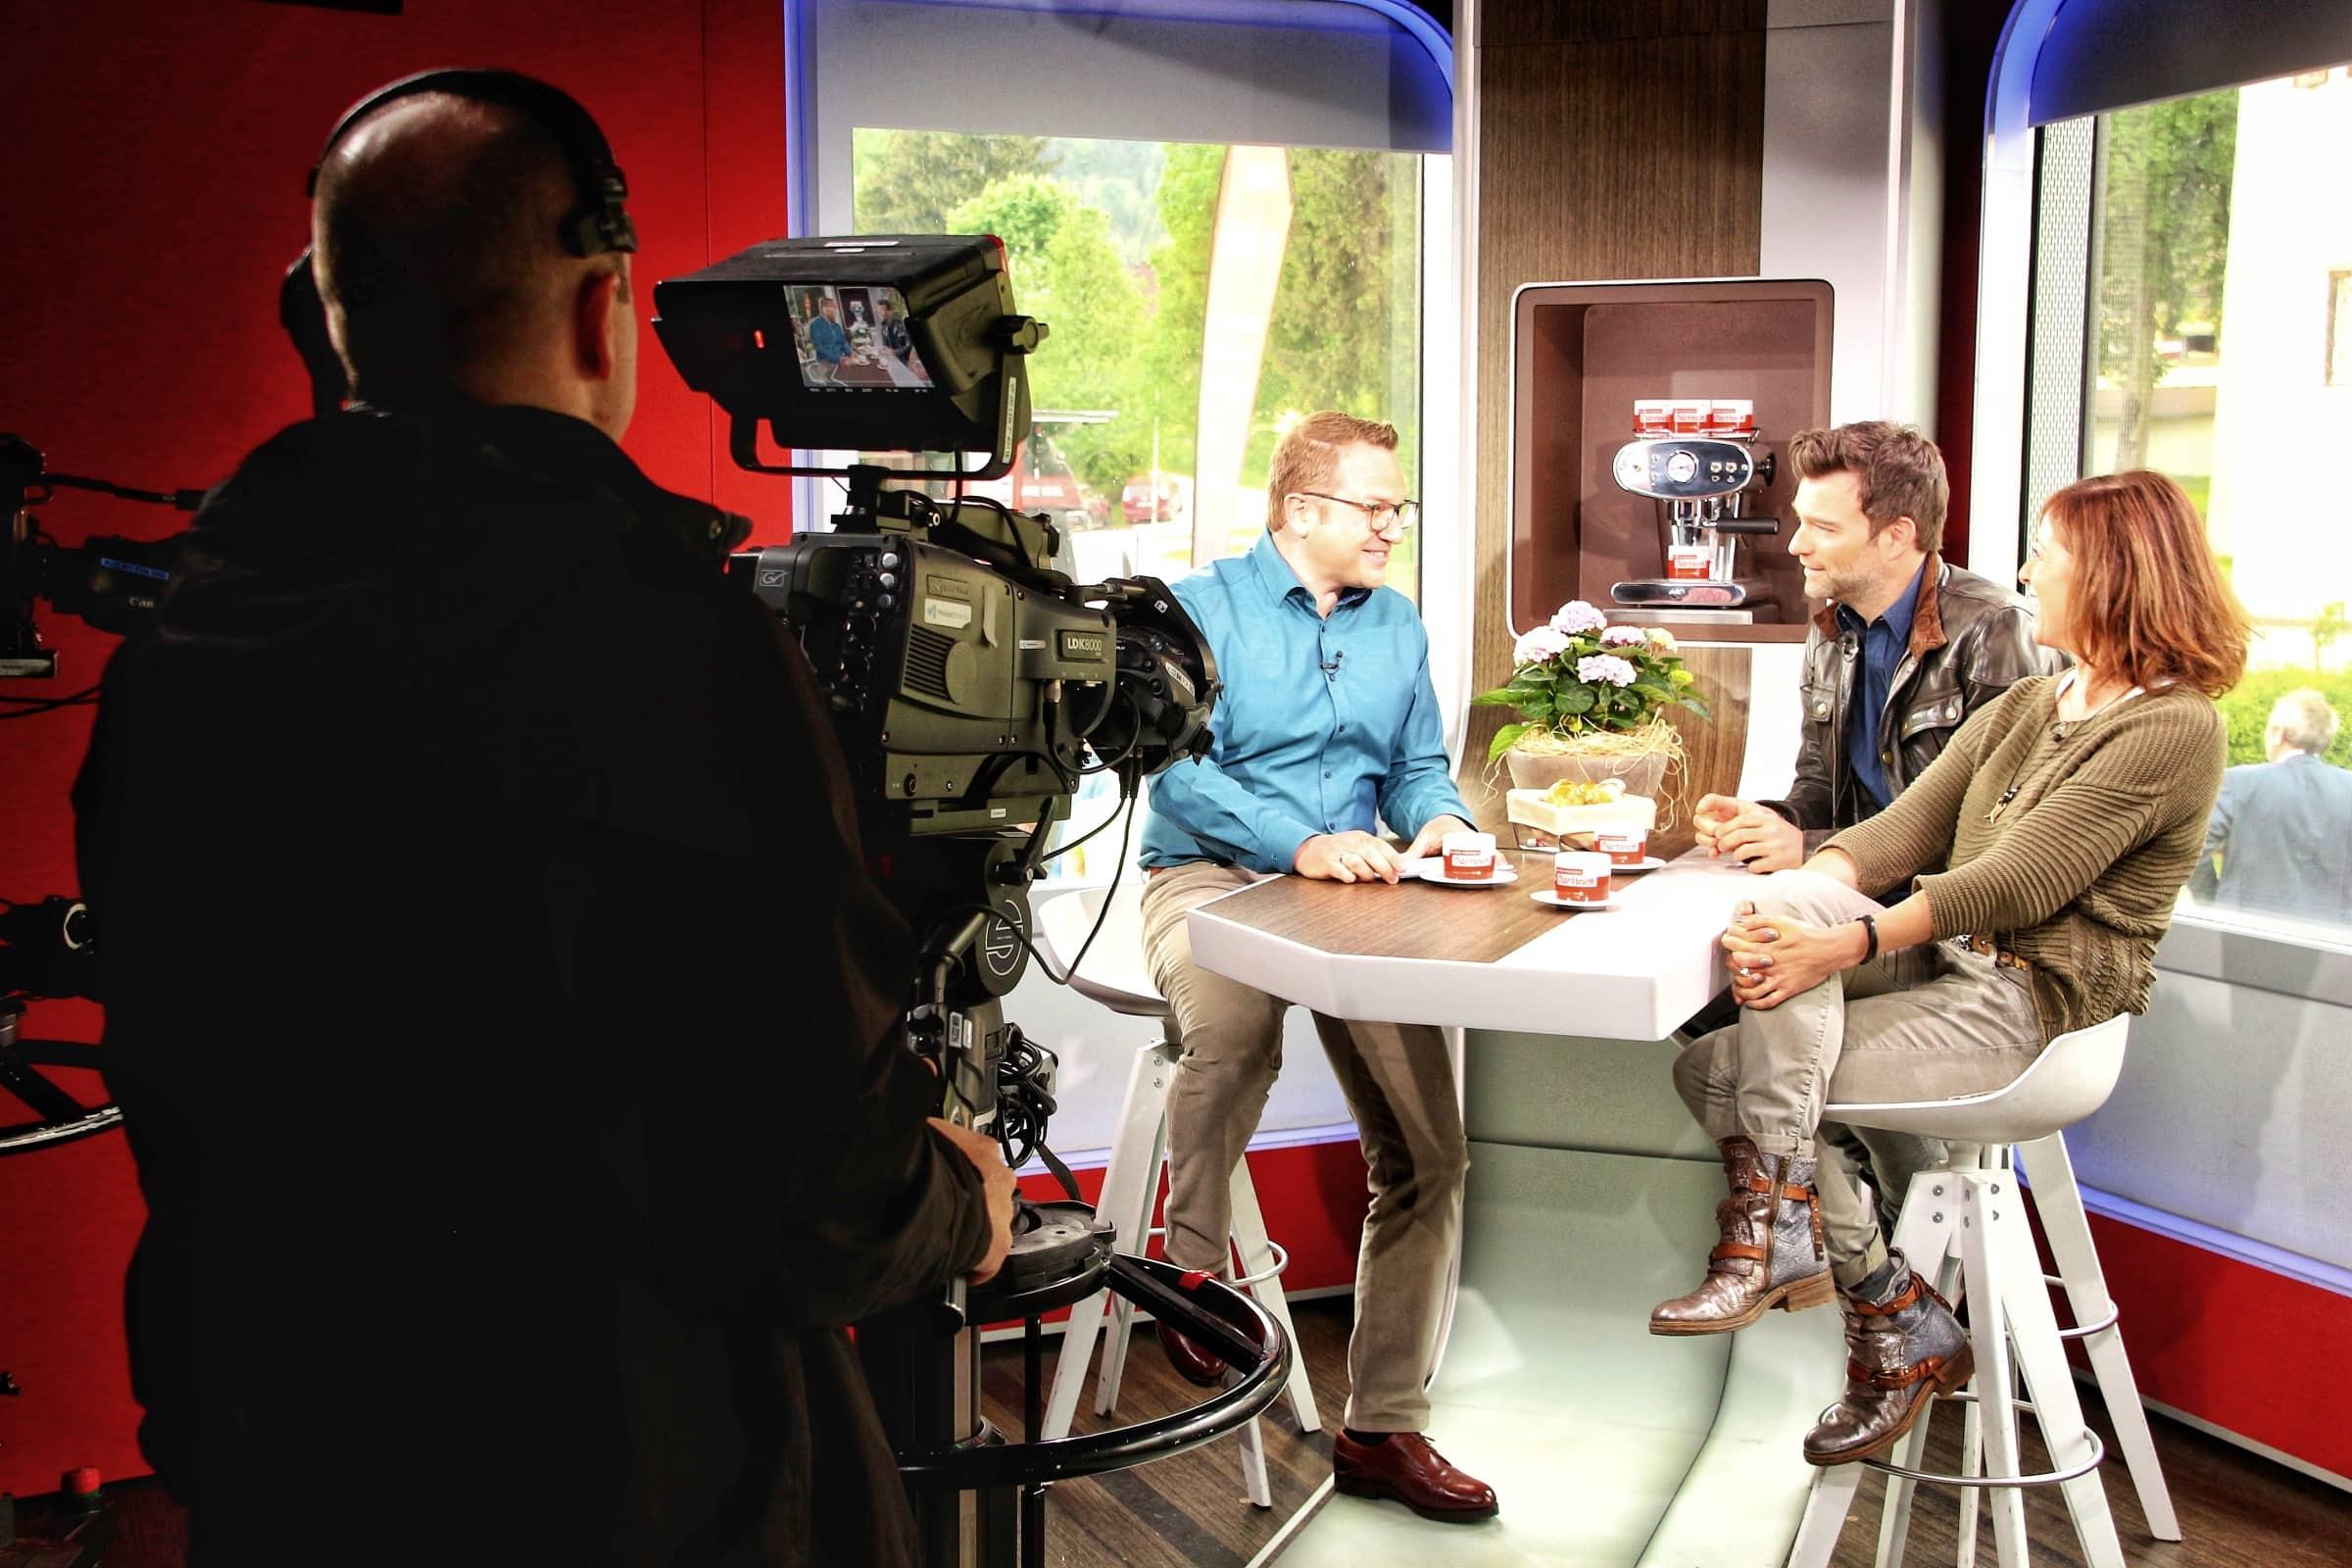 andreas felder kameramann orf unterwegs in österreich 25 02.05.2018 09 22 31 - ORF Unterwegs in Österreich - Tirol